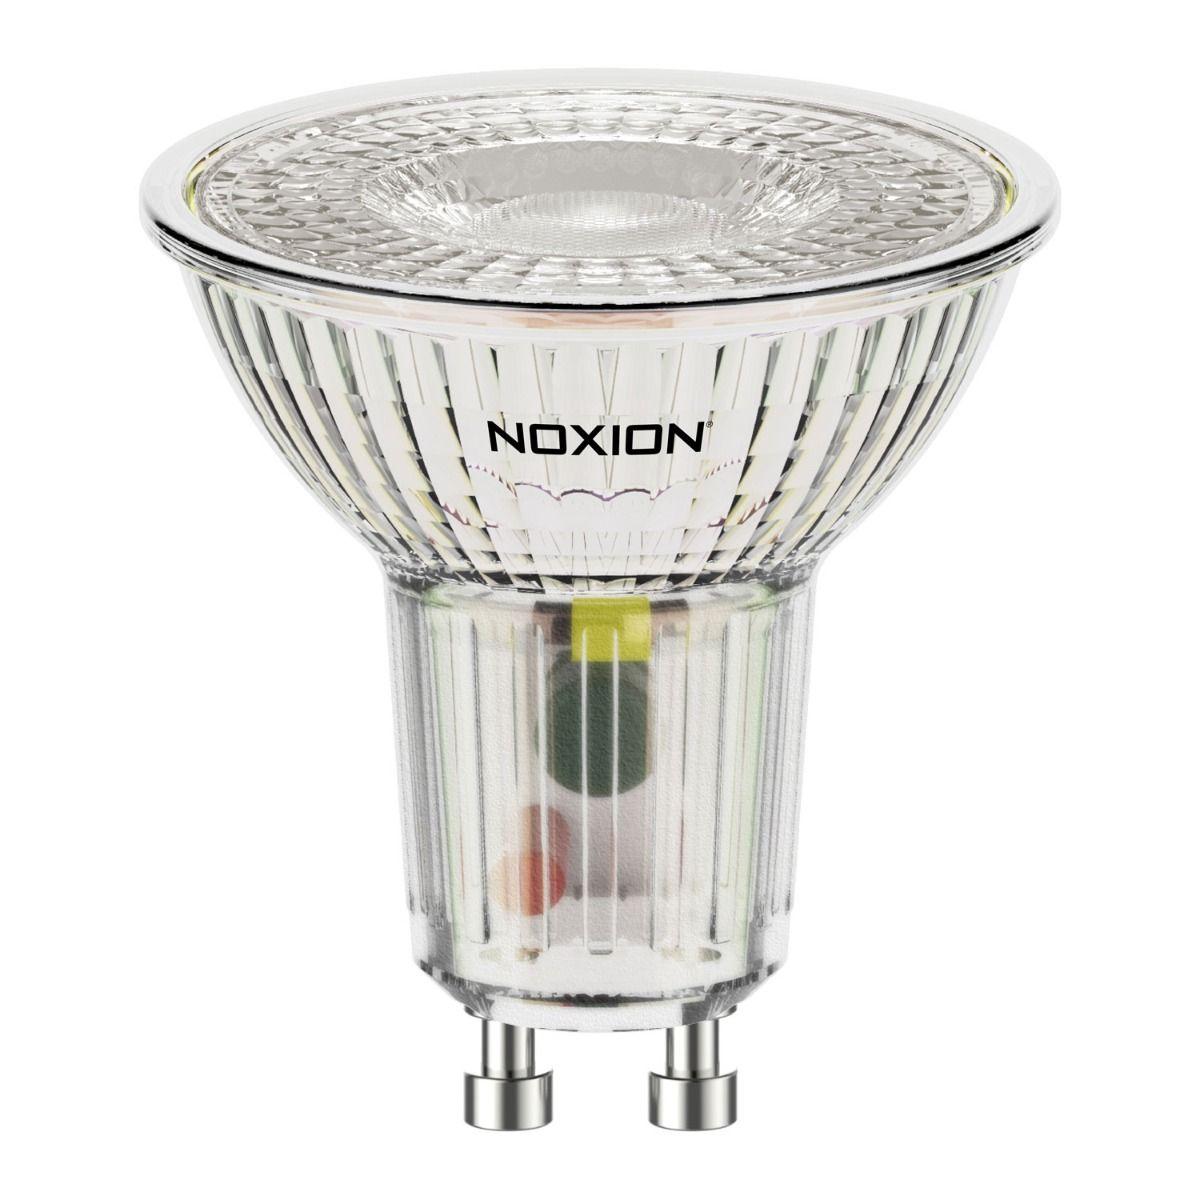 Noxion LED Spot GU10 4W 830 36D 390lm   Vervanger voor 50W